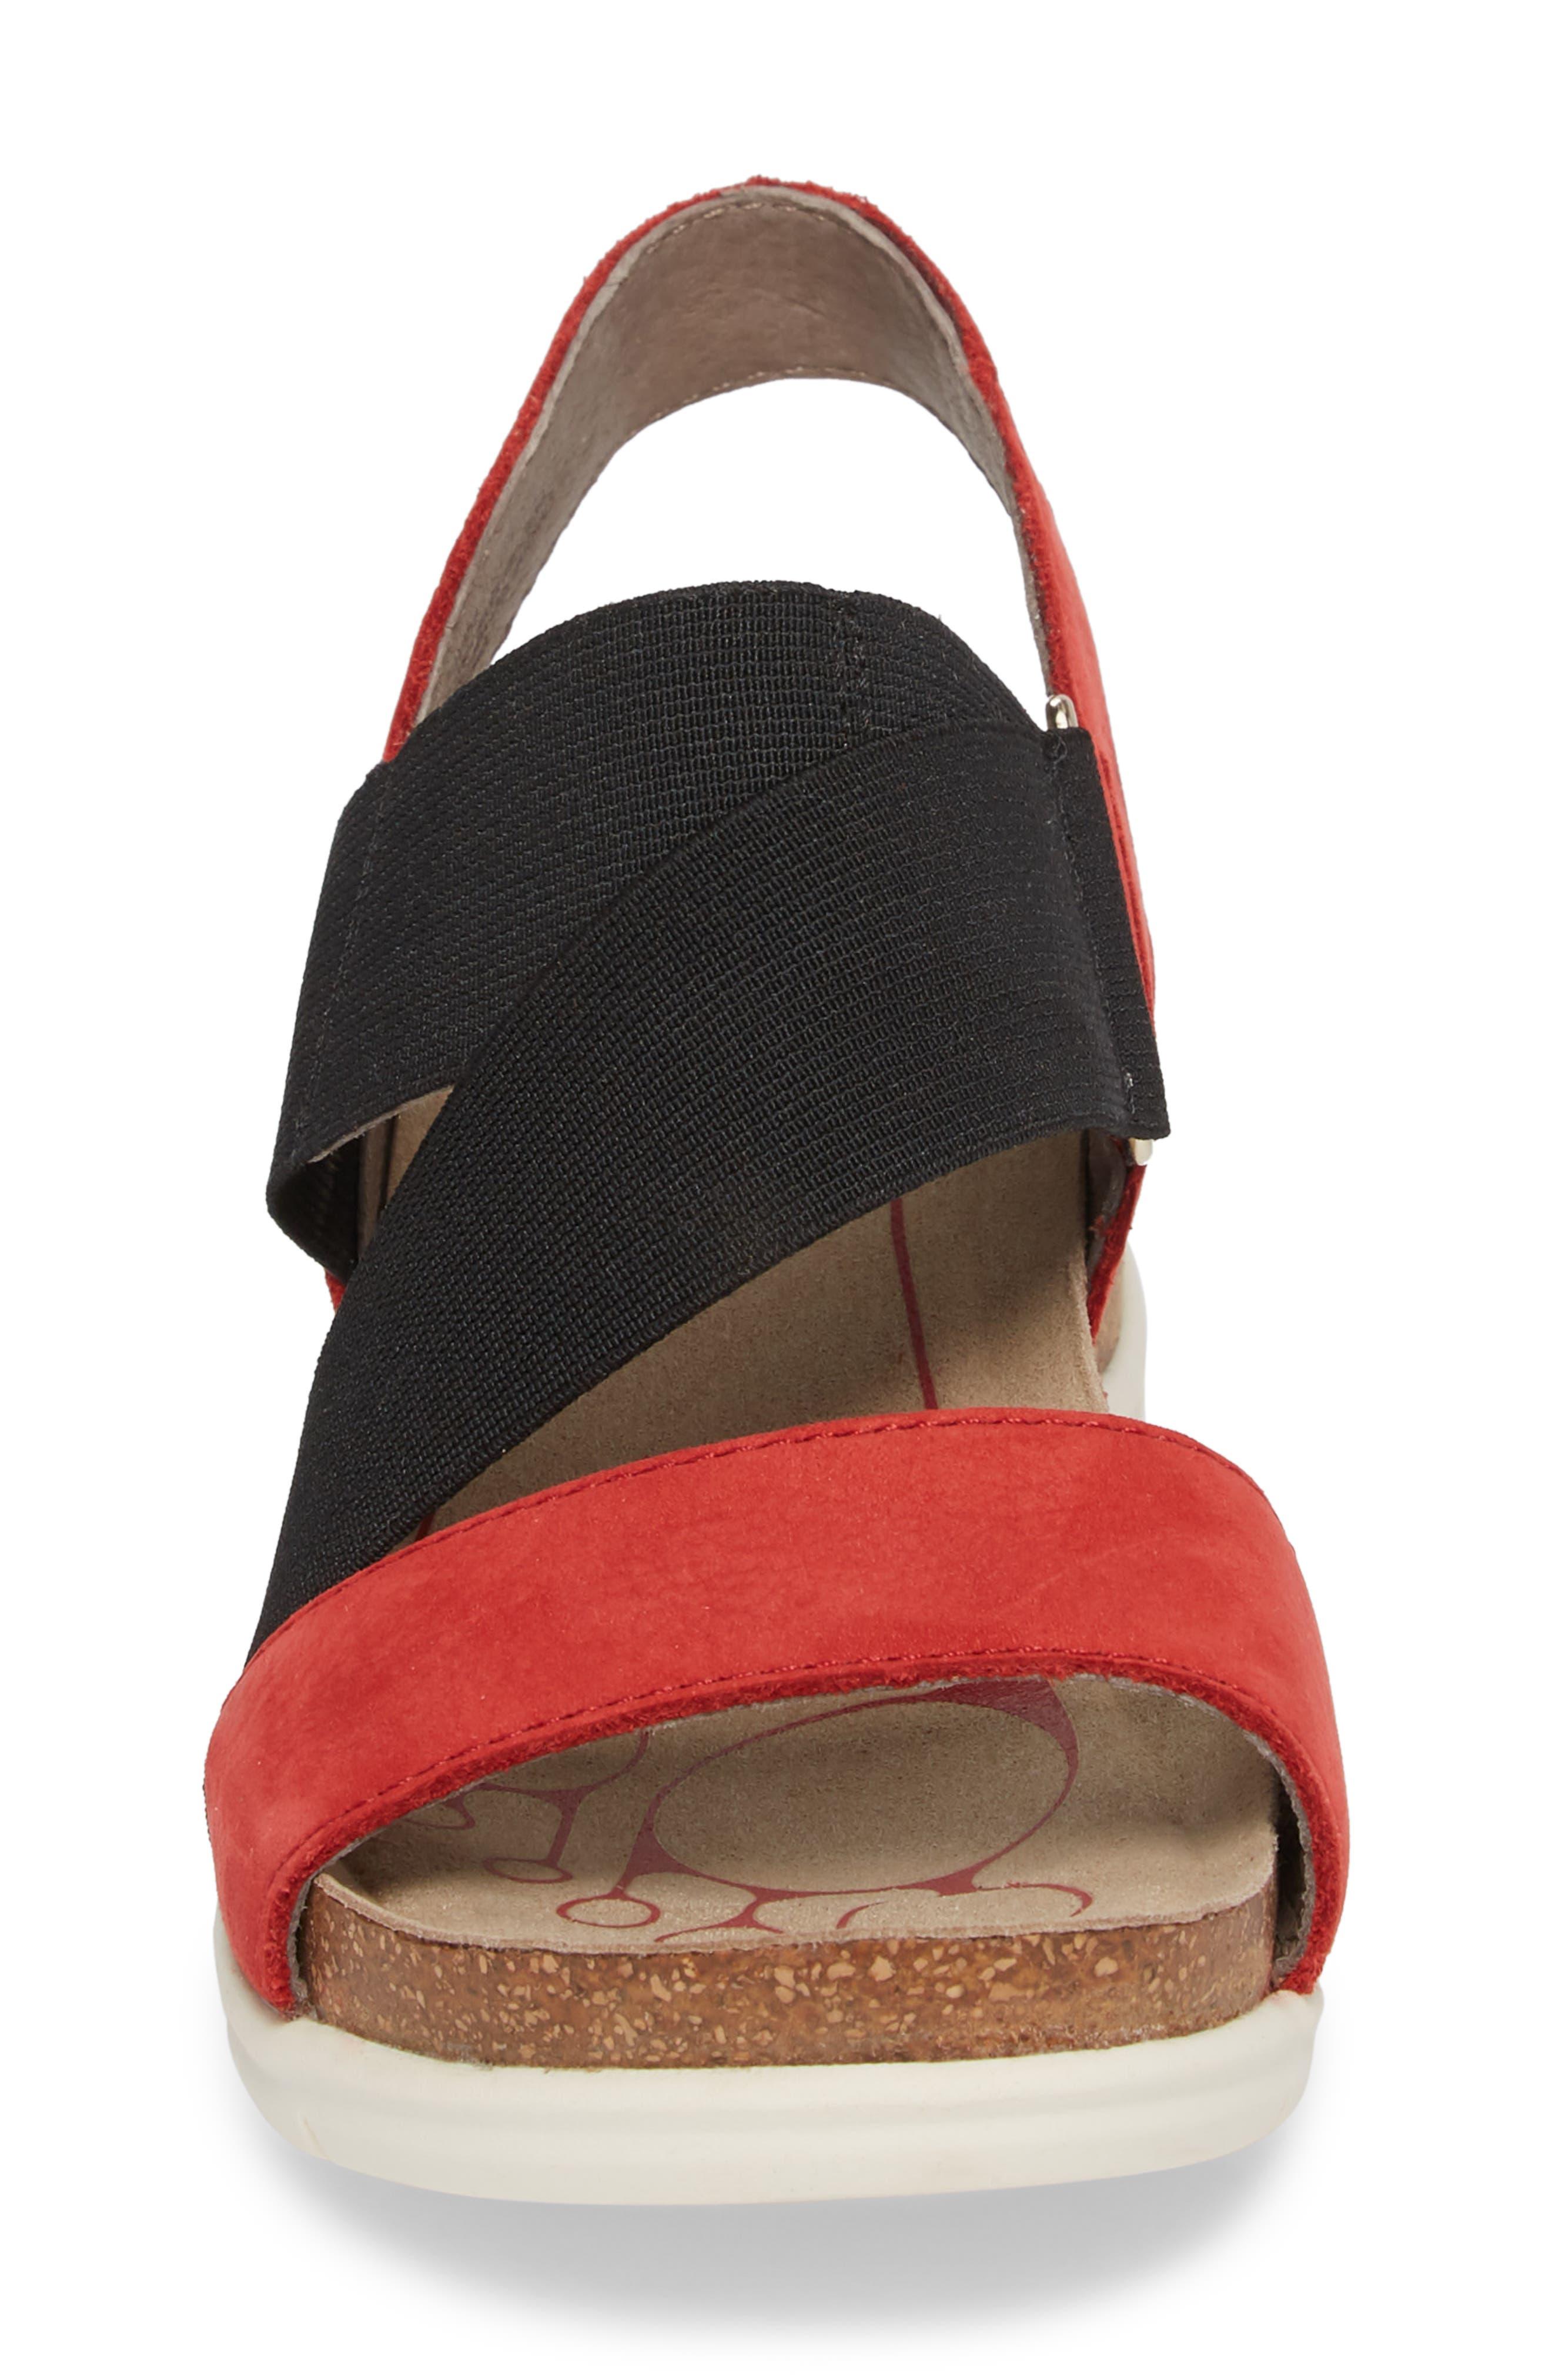 Paisley Wedge Sandal,                             Alternate thumbnail 16, color,